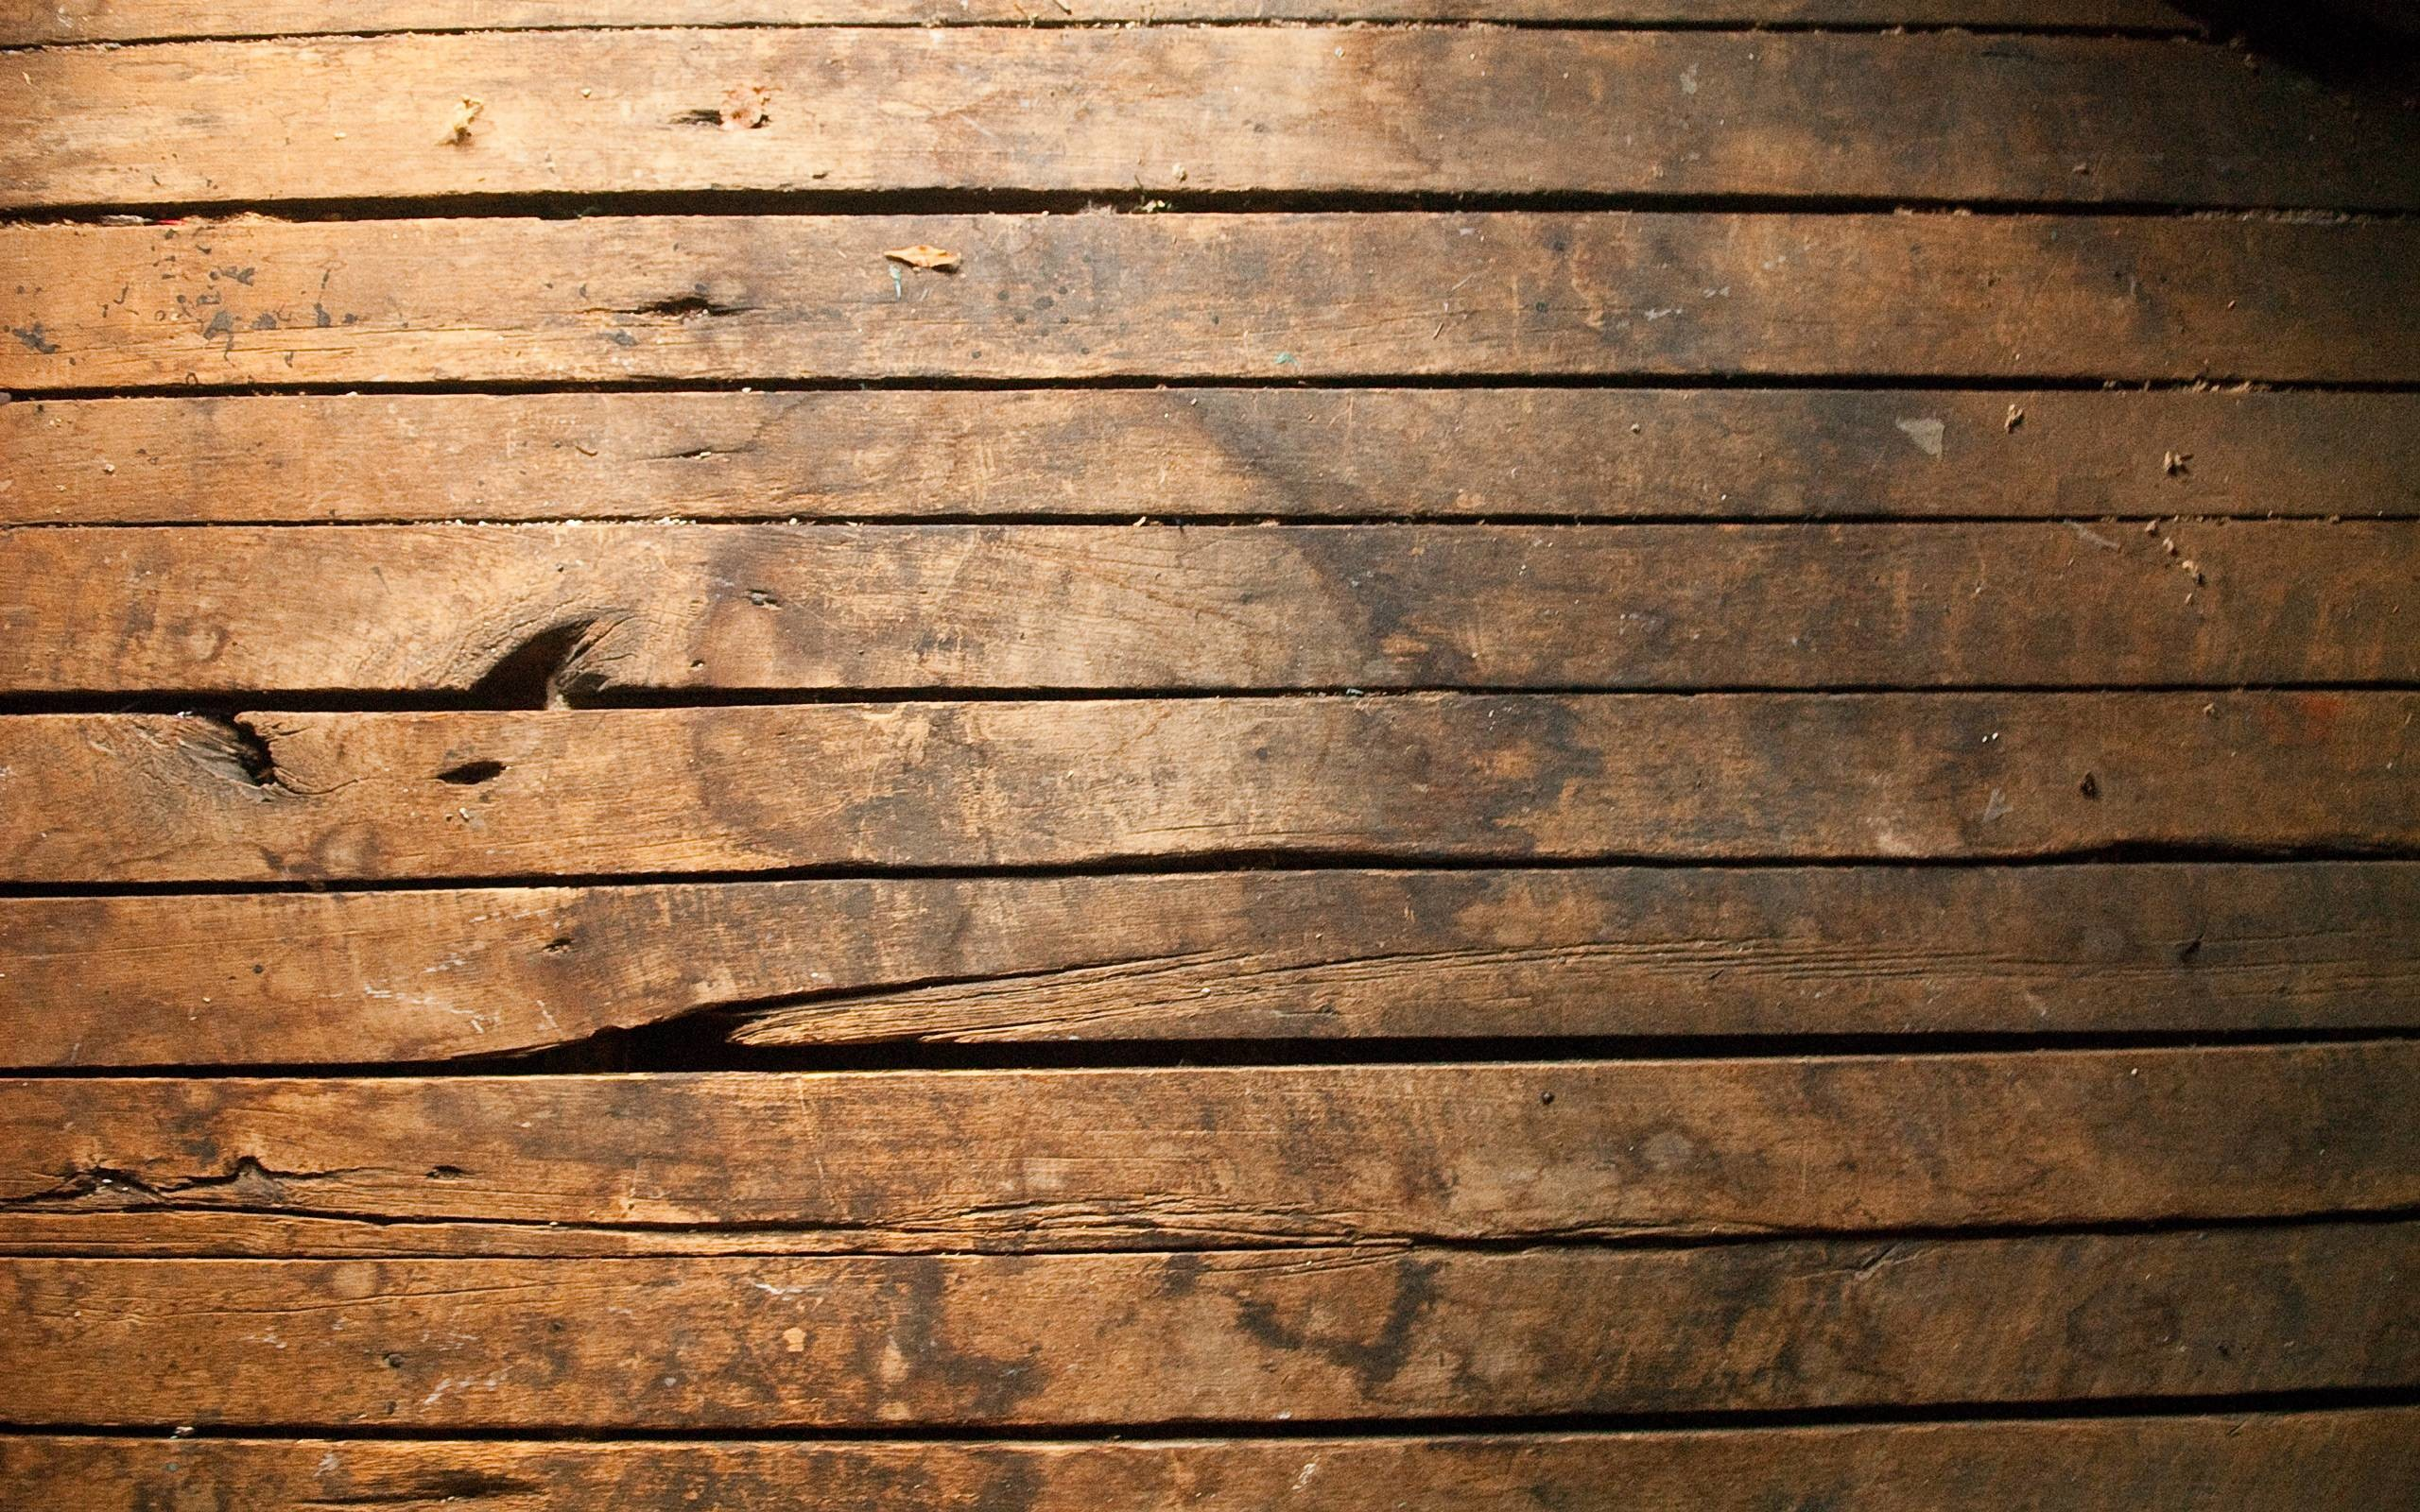 2560x1600 Rustic Wood Wallpaper Widescreen Teal Red 1920x1080 Lights Dark